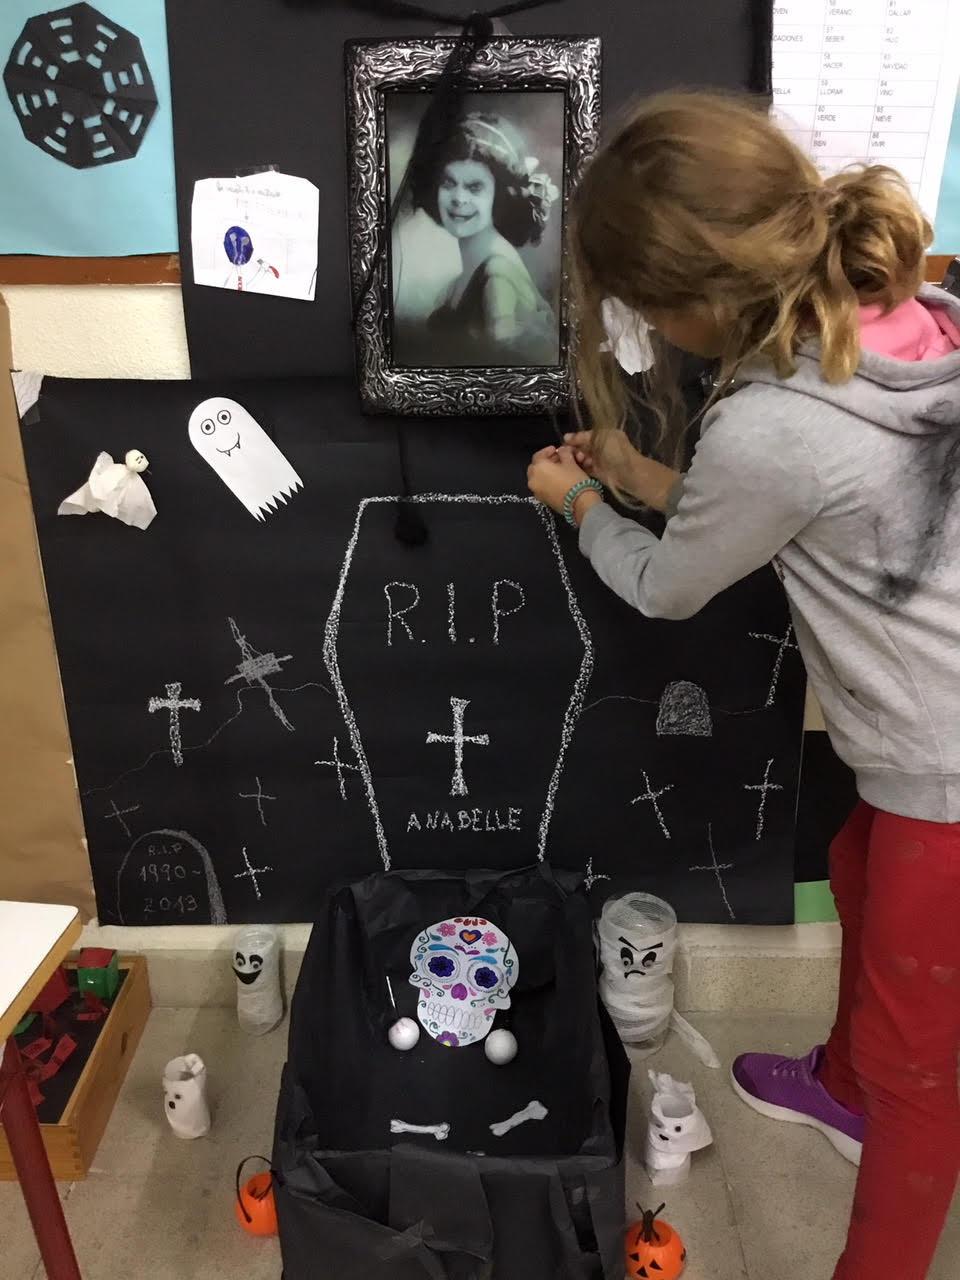 2018_10_31_Cuarto B disfruta en Halloween_CEIP FDLR_Las Rozas 11